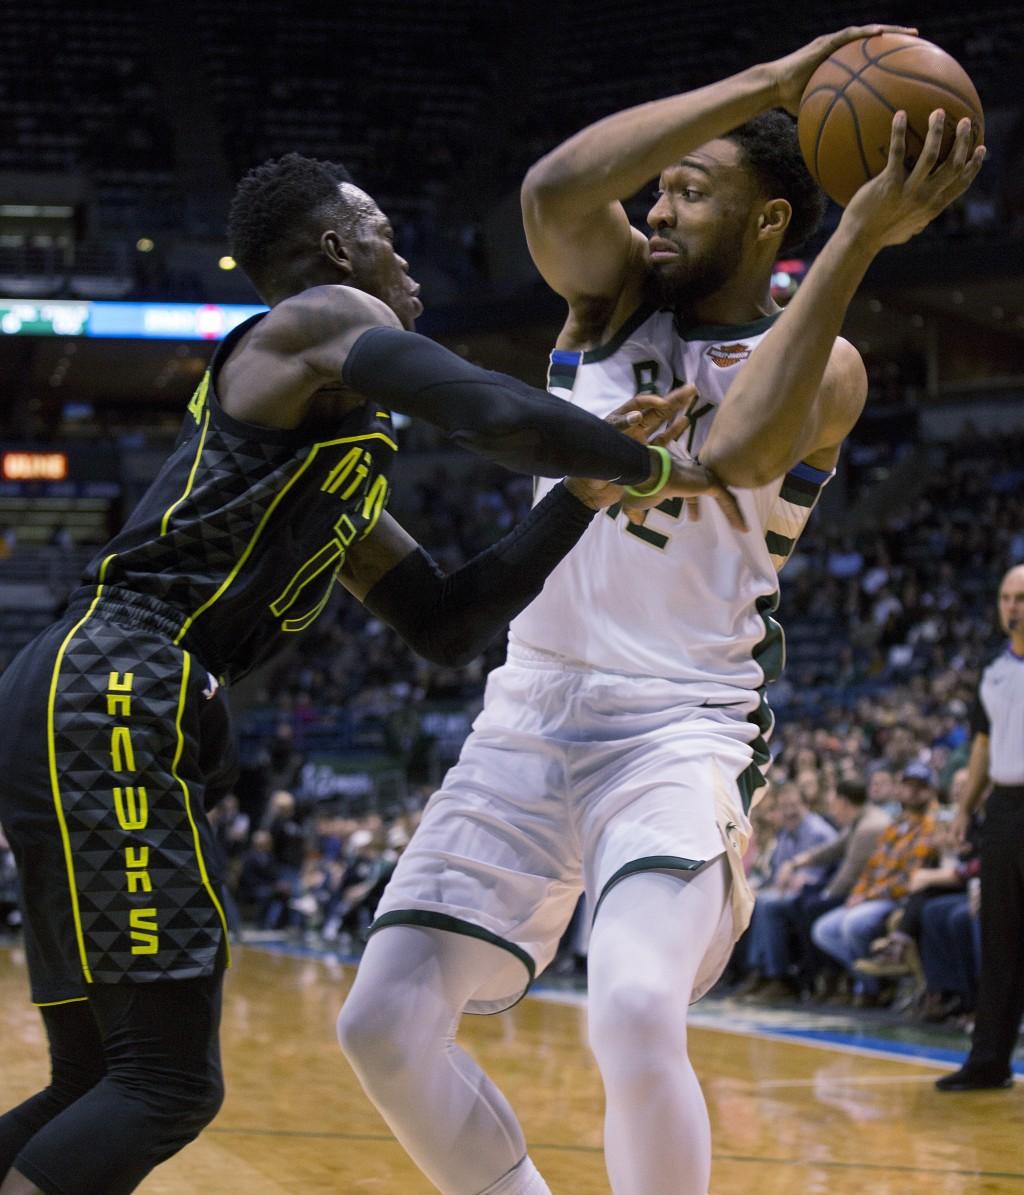 Milwaukee Bucks forward Jabari Parker, right, is defended by Atlanta Hawks guard Dennis Schroder, left, during the first half of an NBA basketball gam